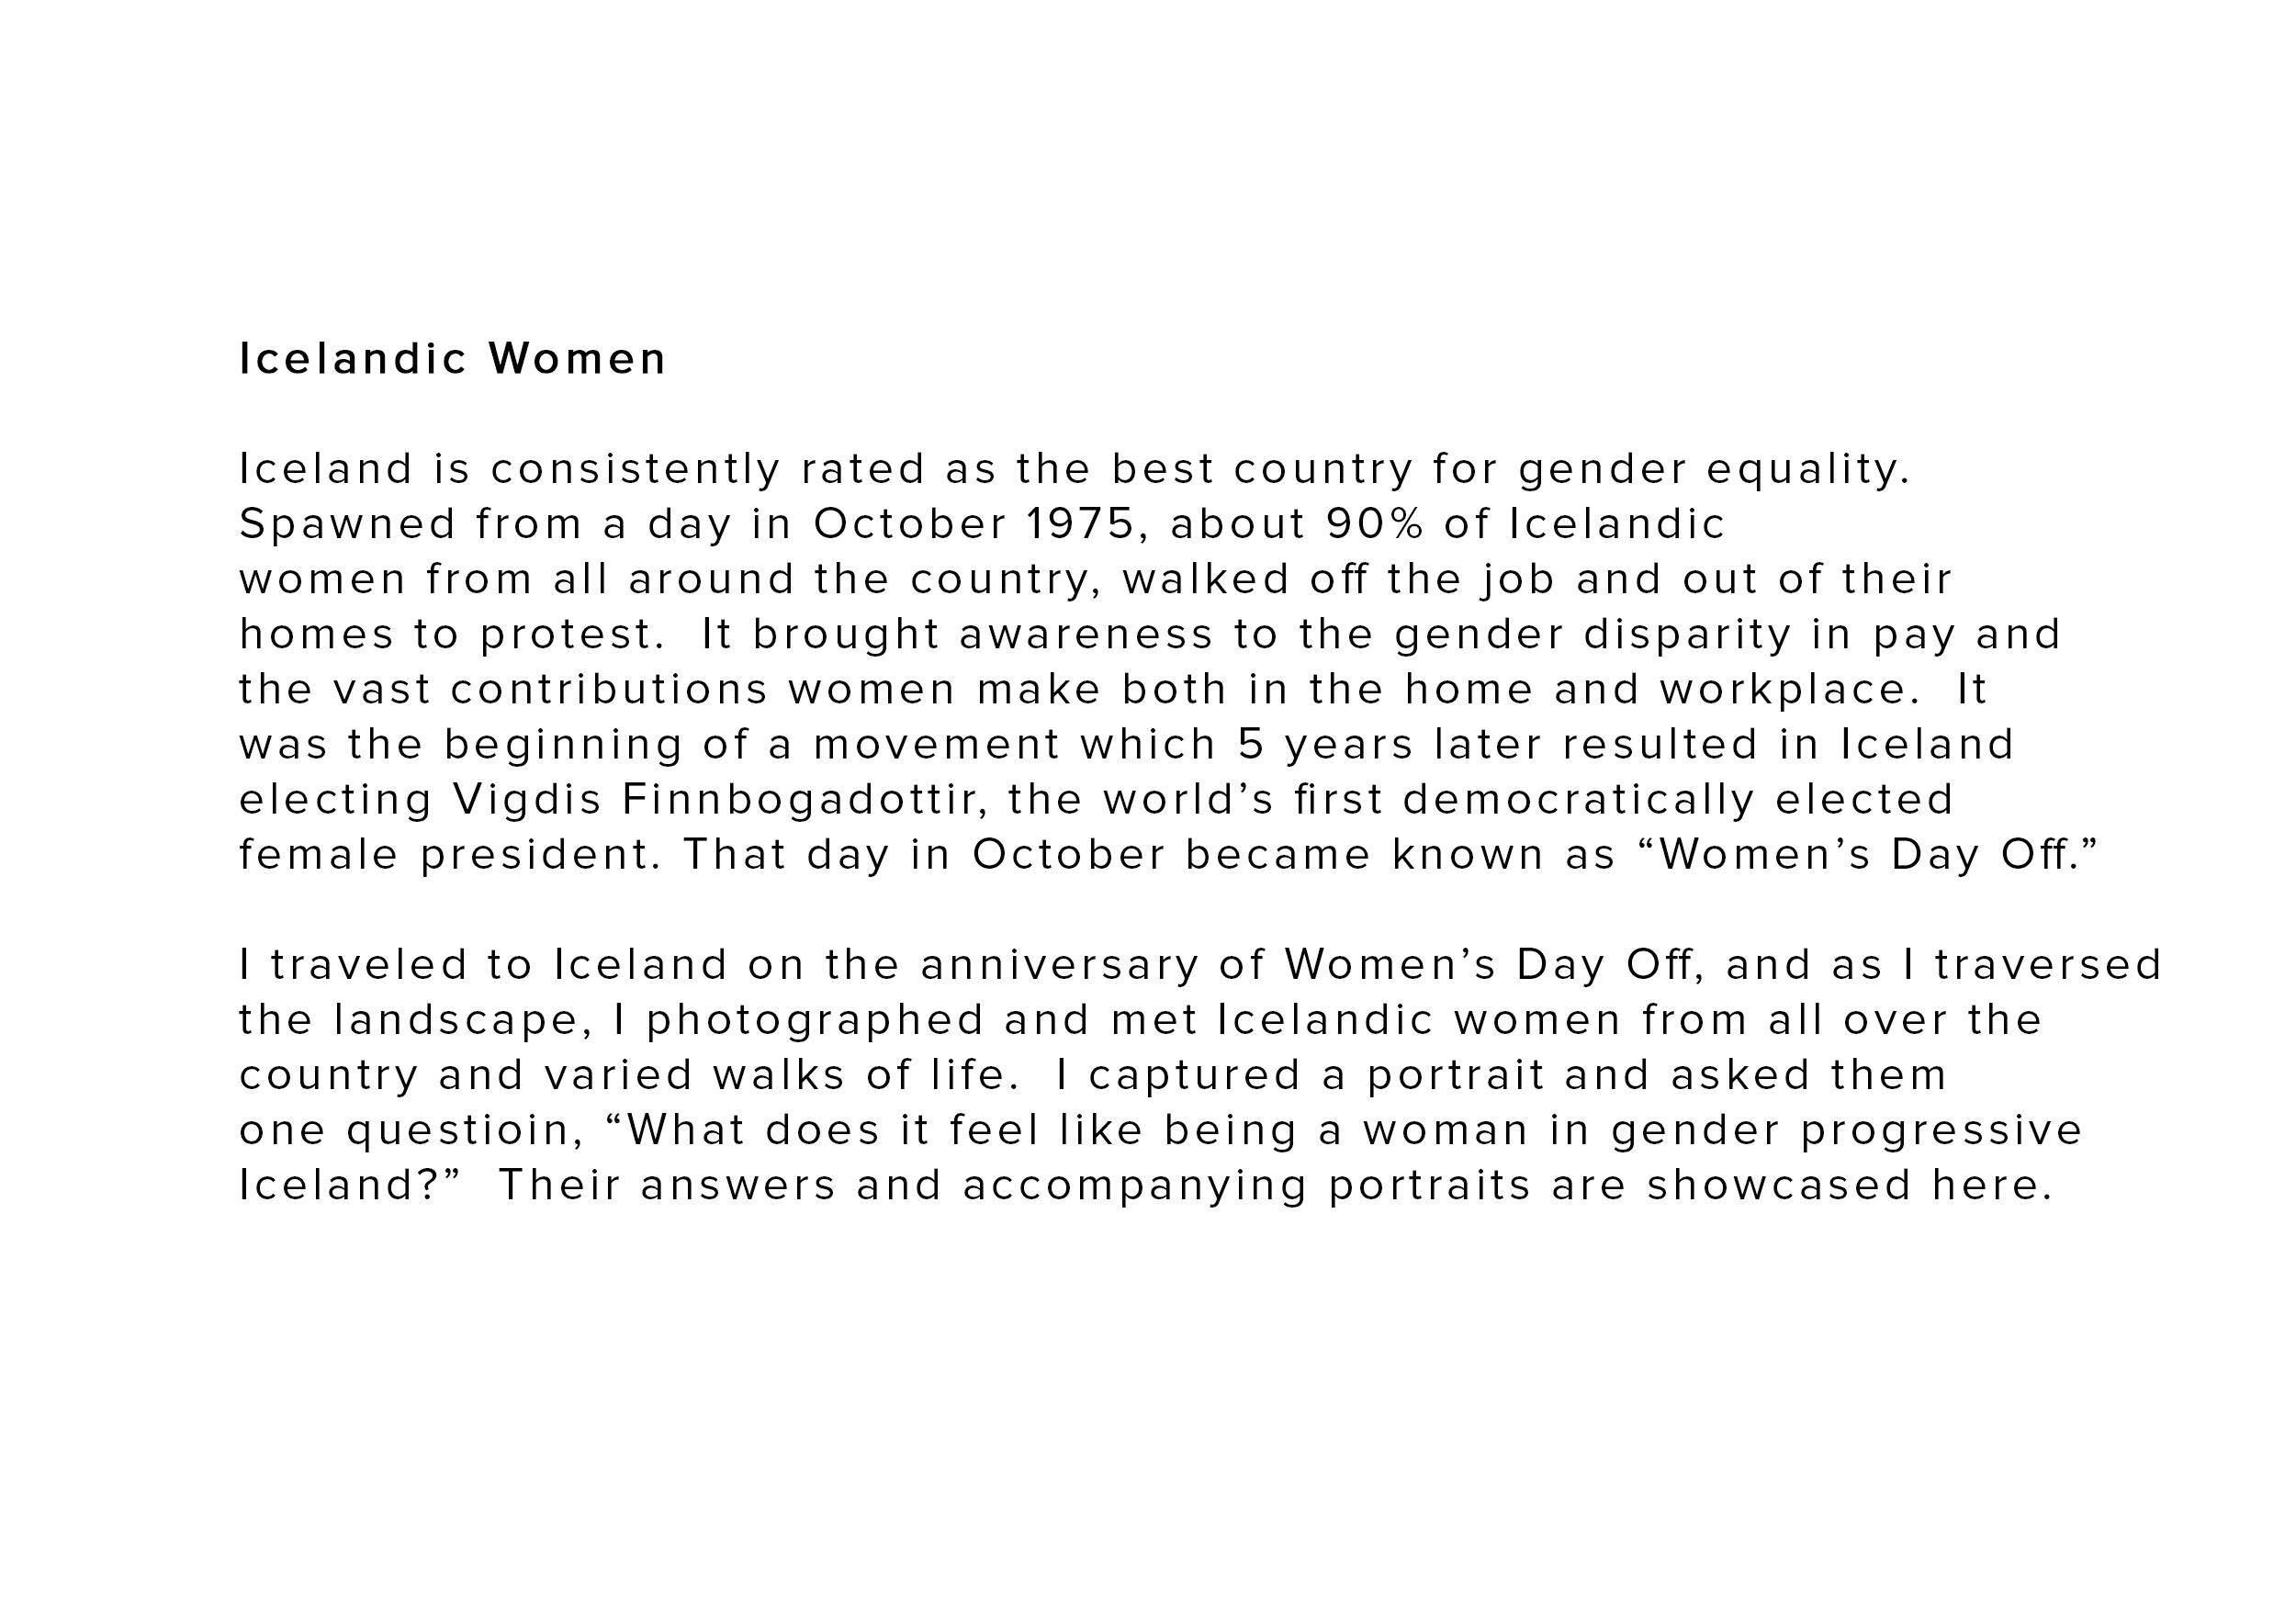 Icelandic Women Text.jpg